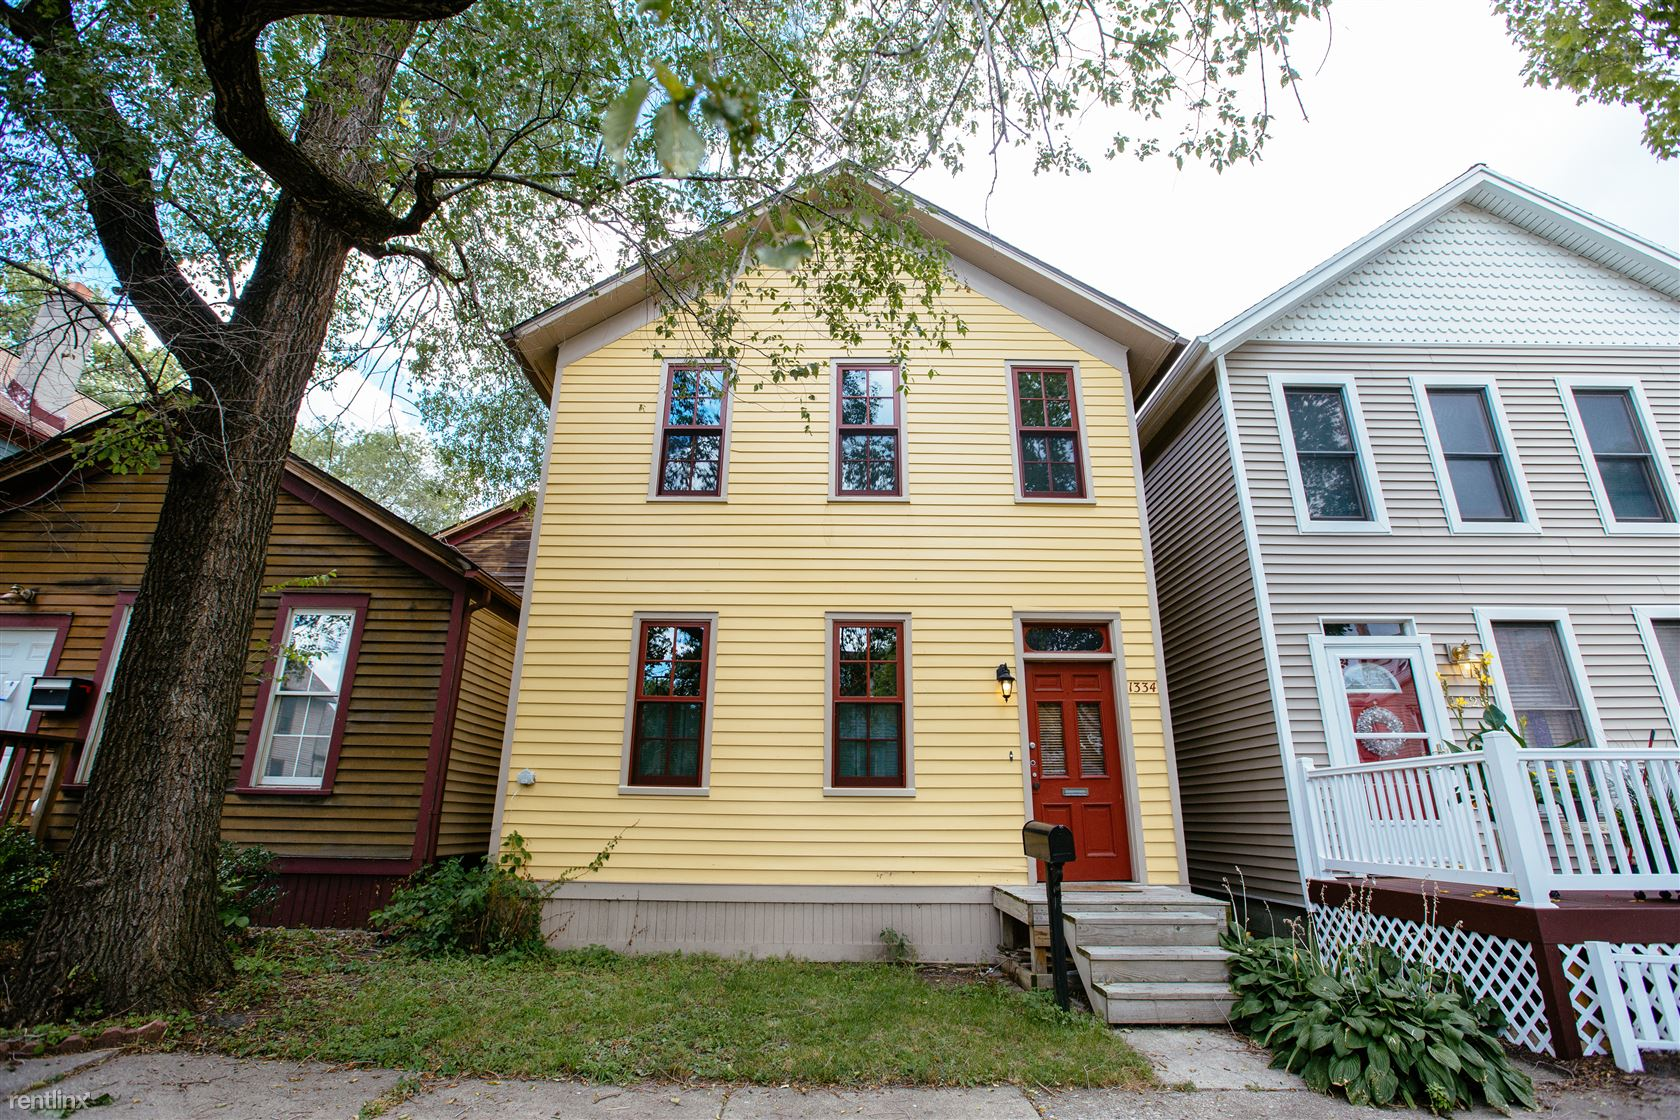 1334 Labrosse St, Detroit, MI - $2,200 USD/ month